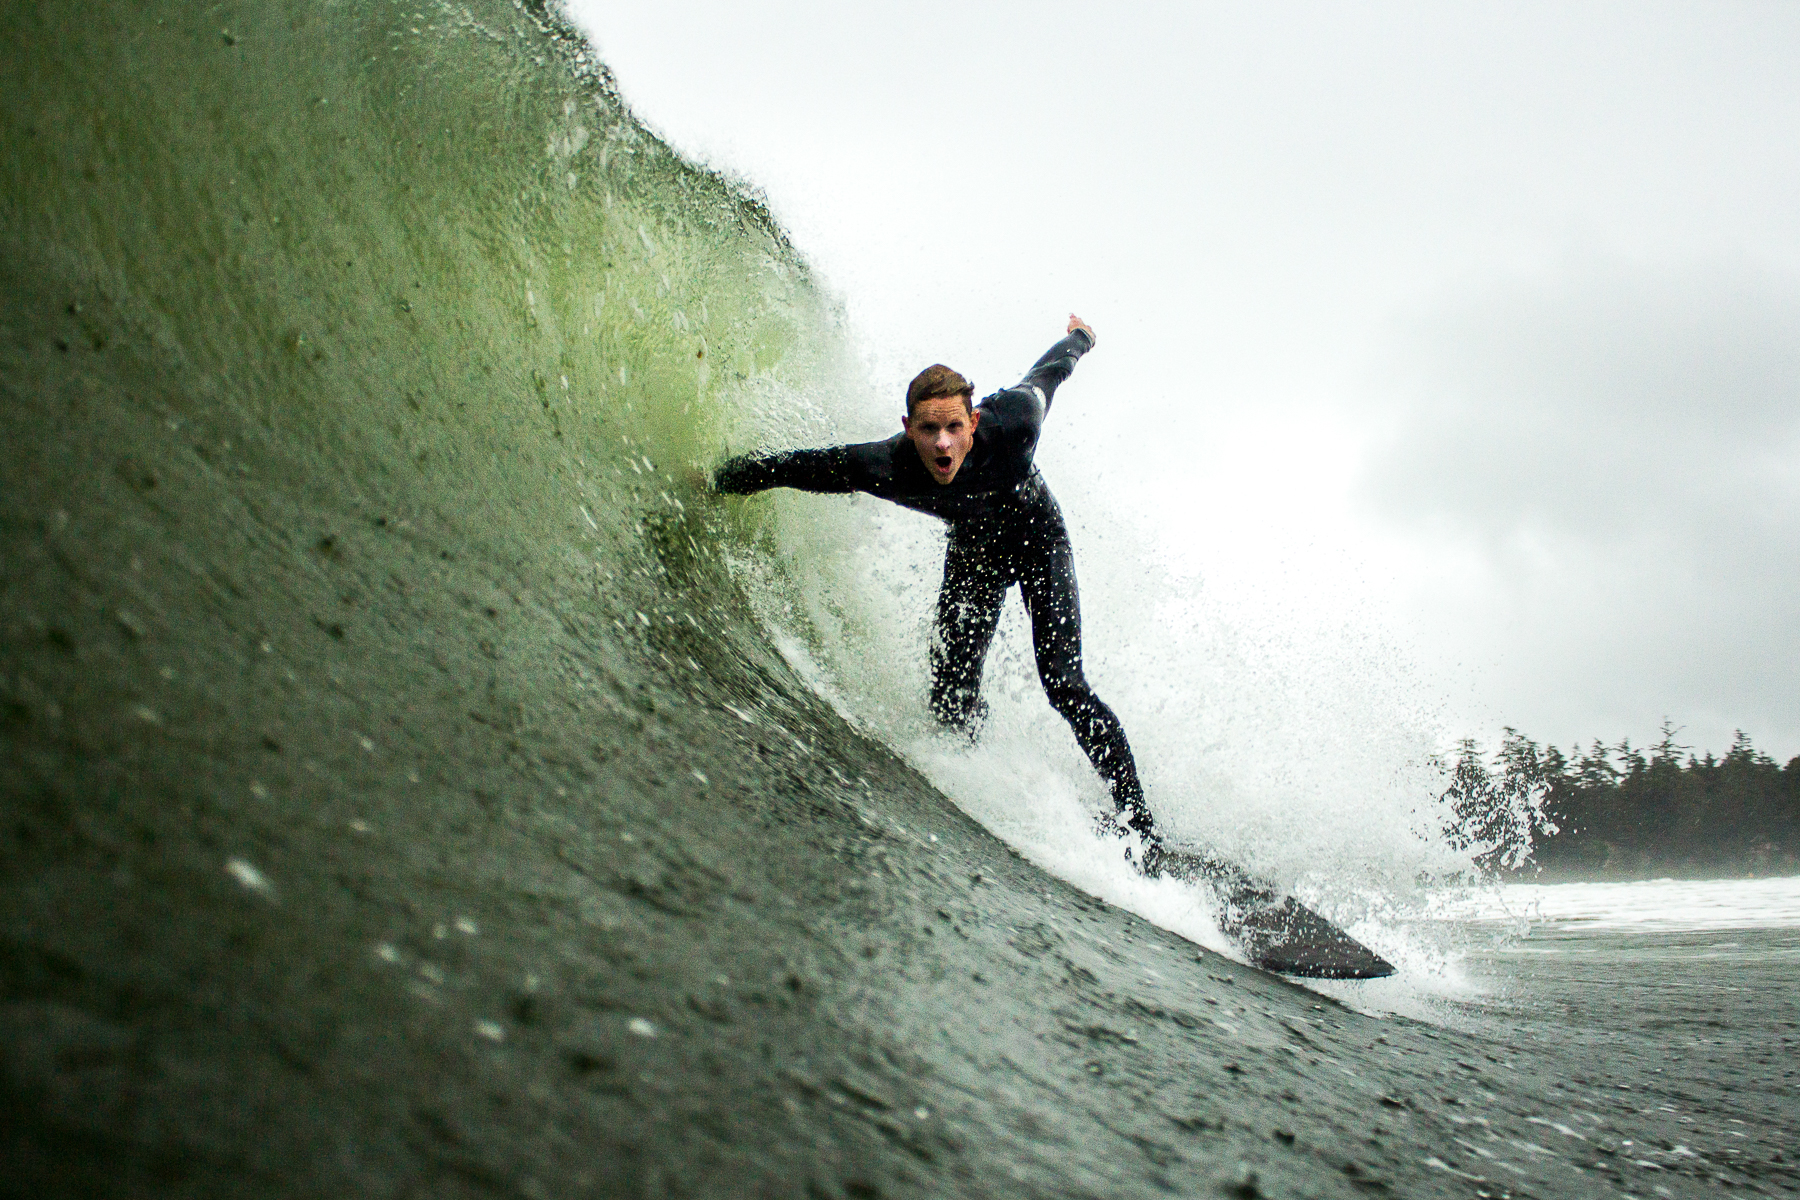 tofino_surf_photography-Elliott_moore.jpg